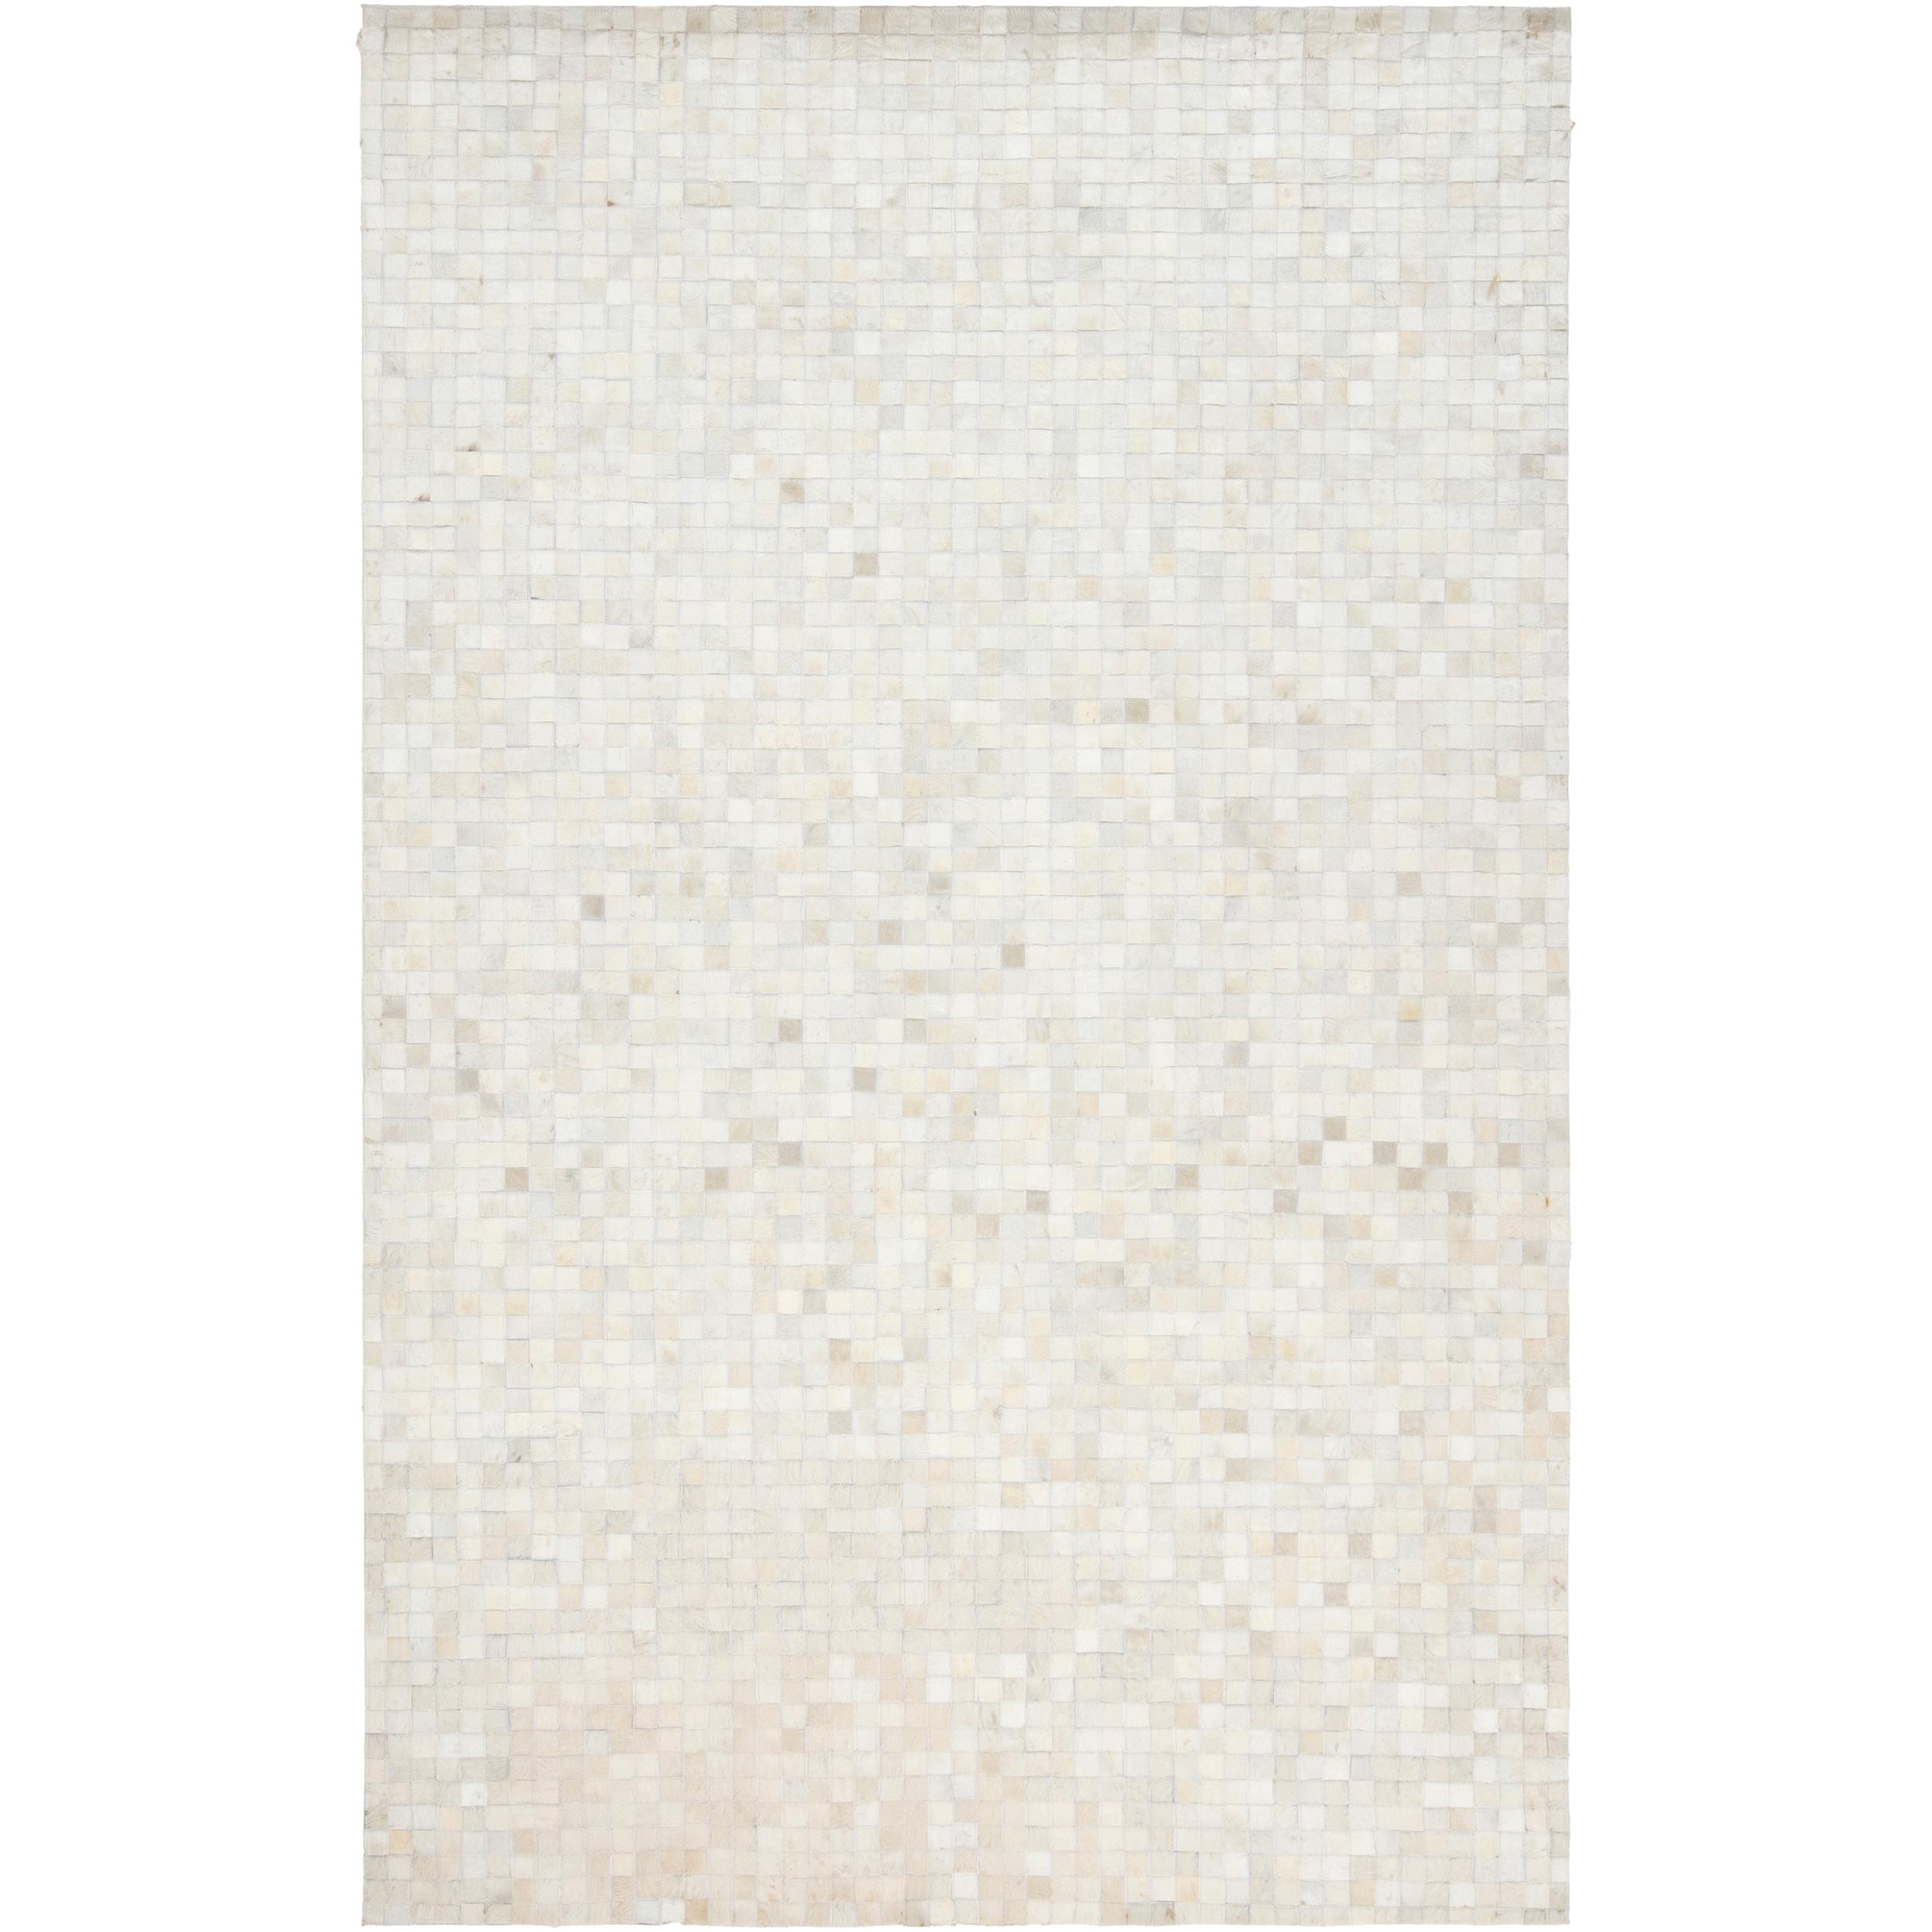 Hand crafted leather animal hide geometric squares trailblazer rug 8 x 10 l14292738